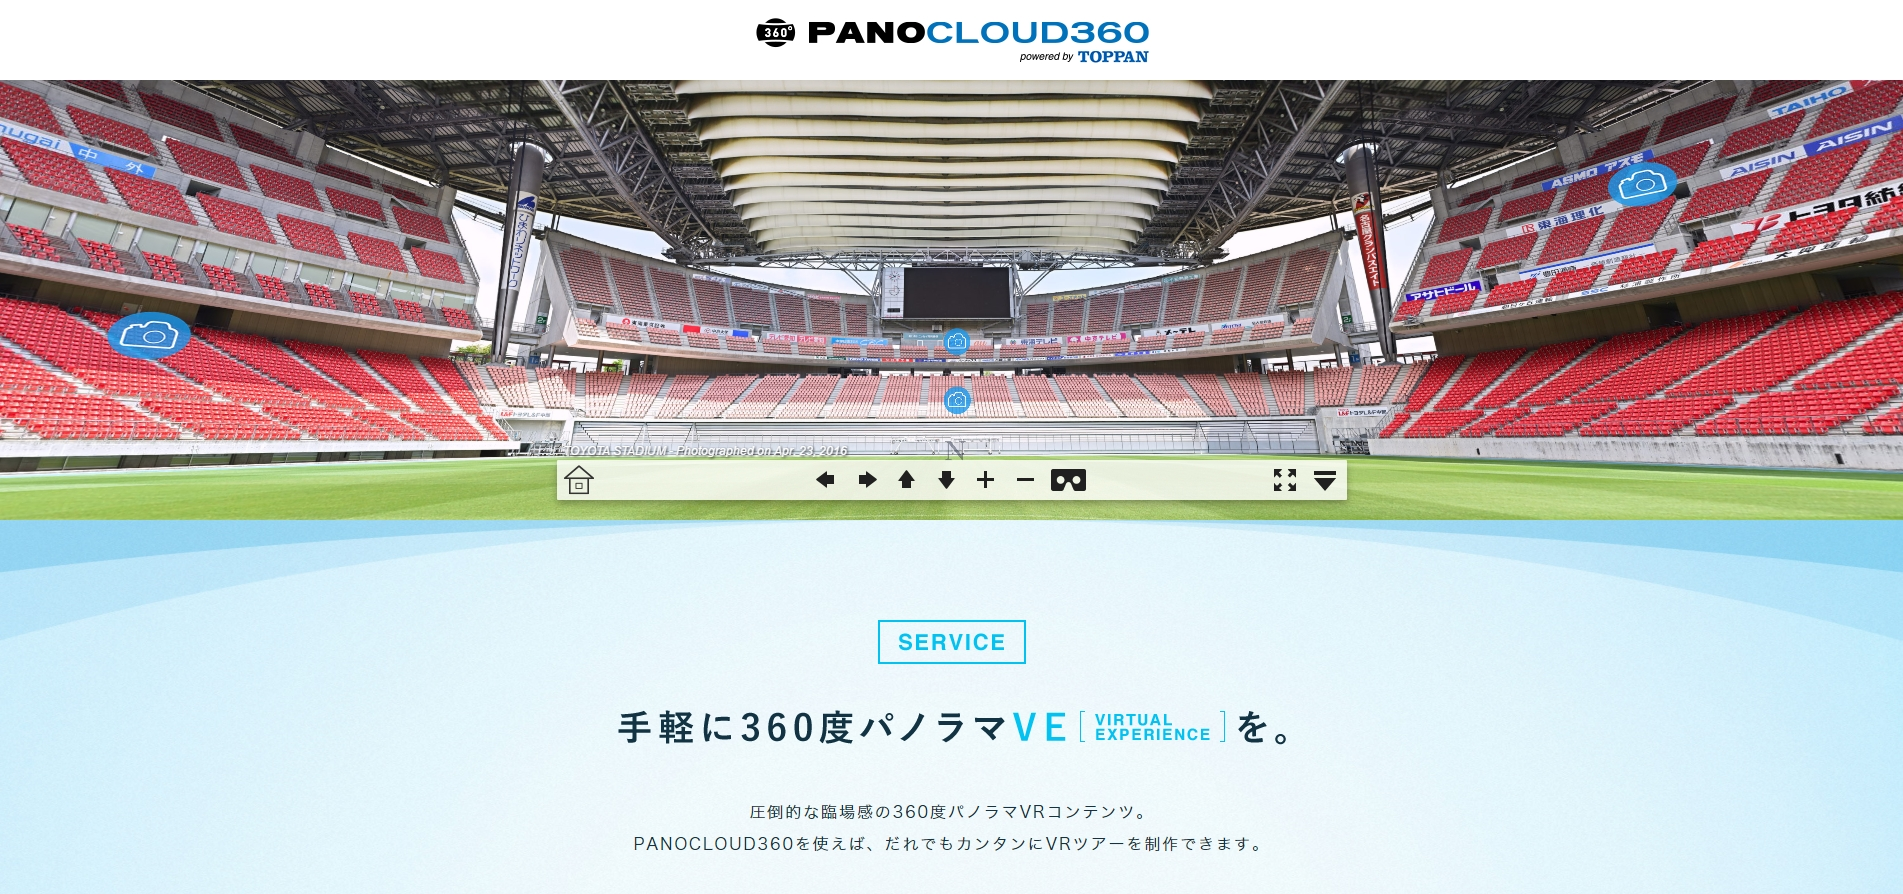 PANOCLOUD360